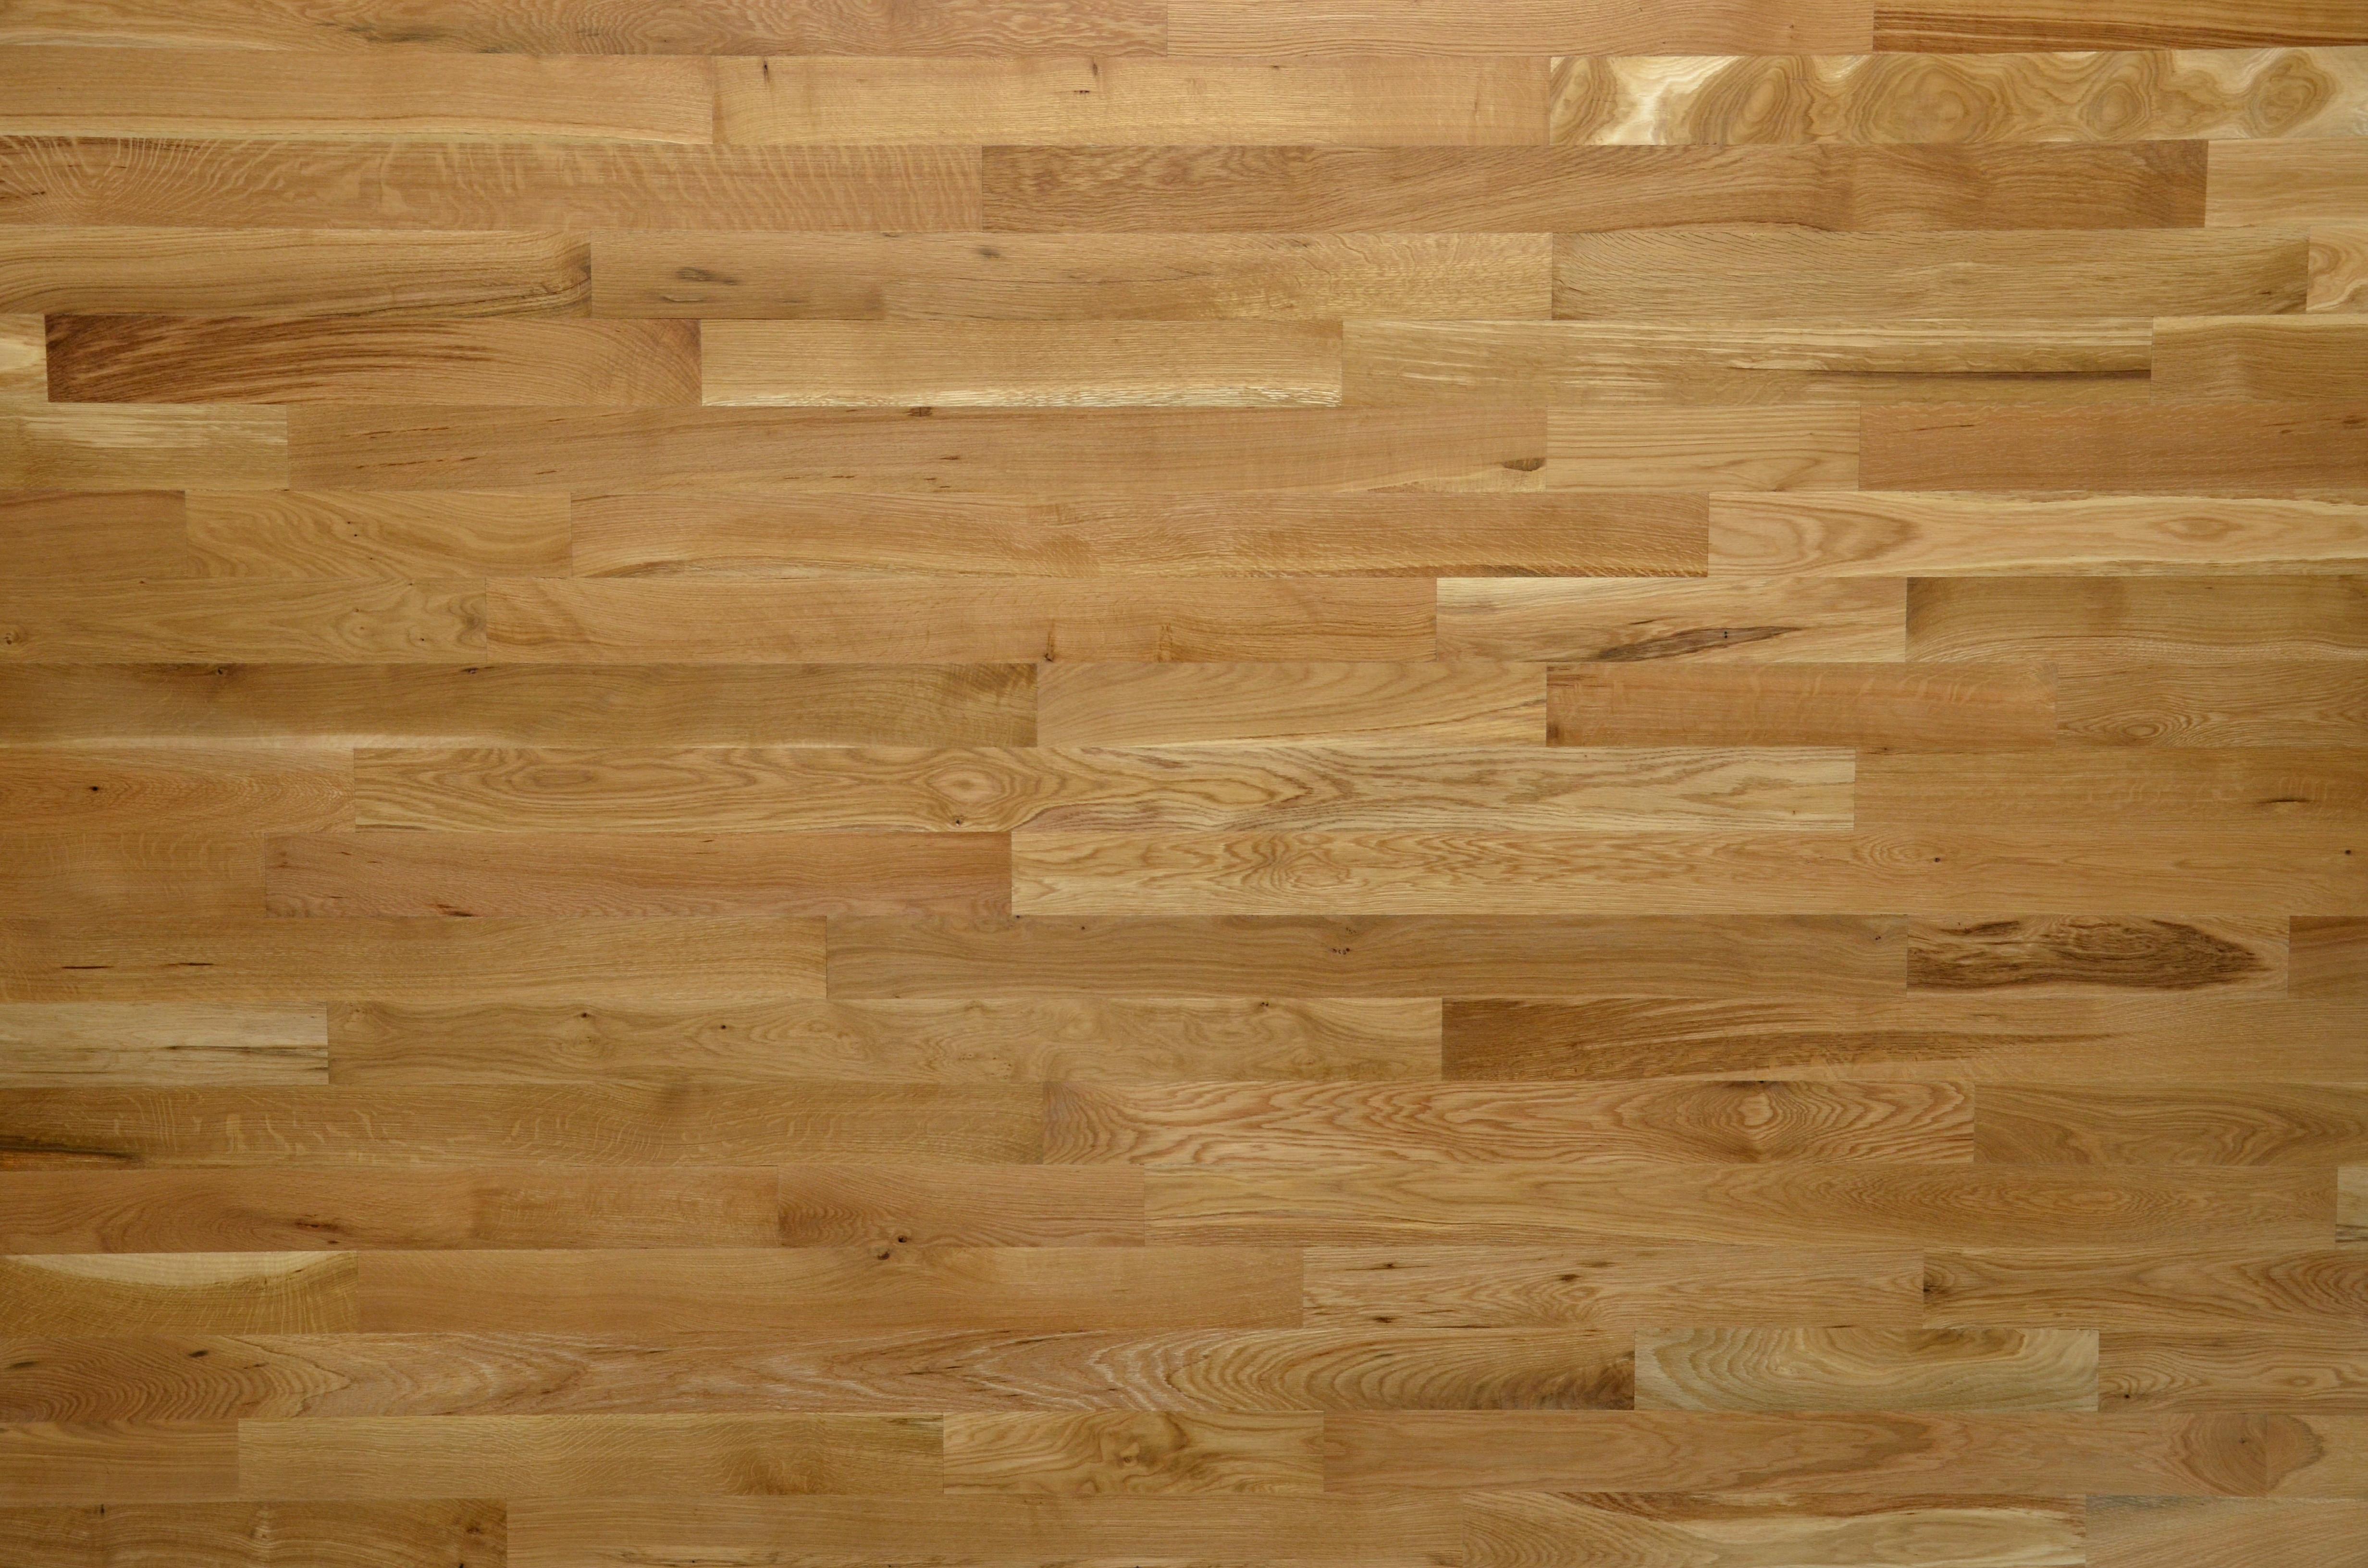 hardwood flooring deals in gta of lacrosse hardwood flooring walnut white oak red oak hickory with 1 common white oak a floor